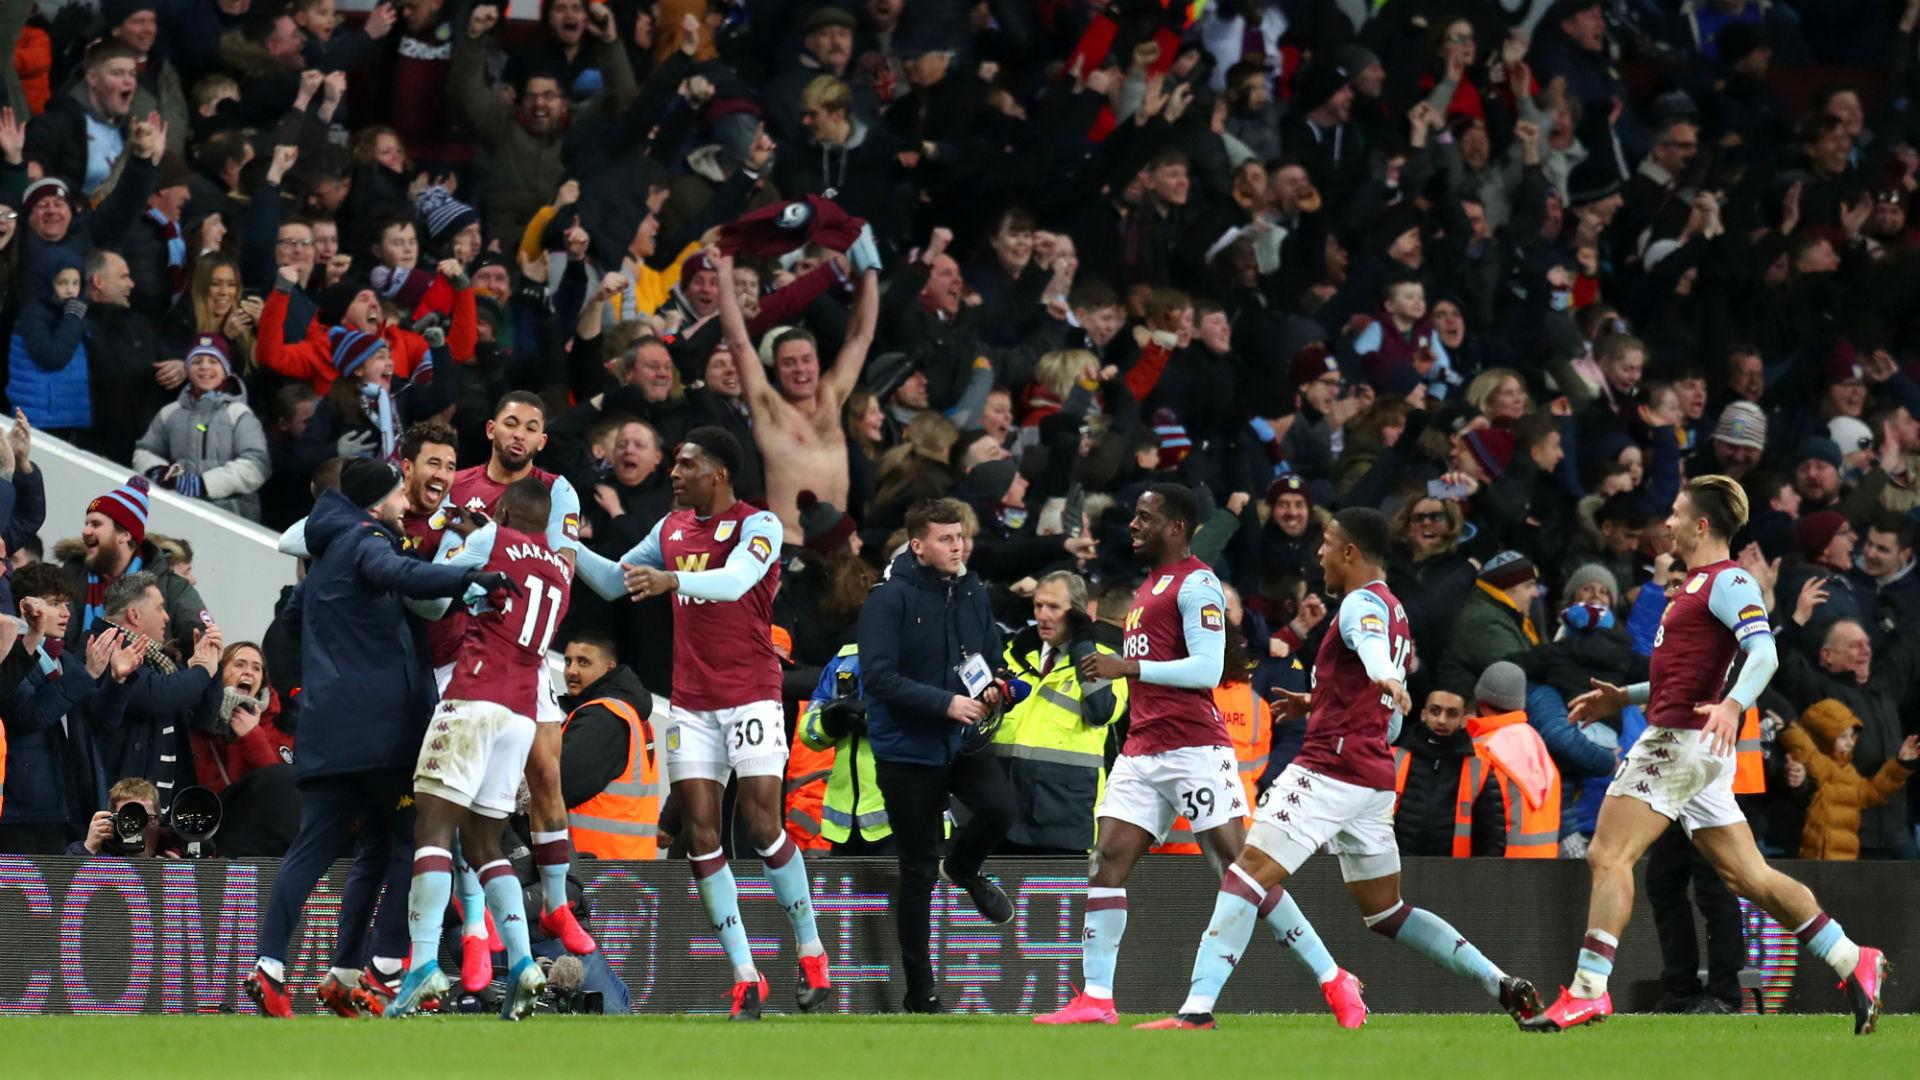 Aston Villa hero Trezeguet reveals training drill with Elmohamady after Leicester City winner